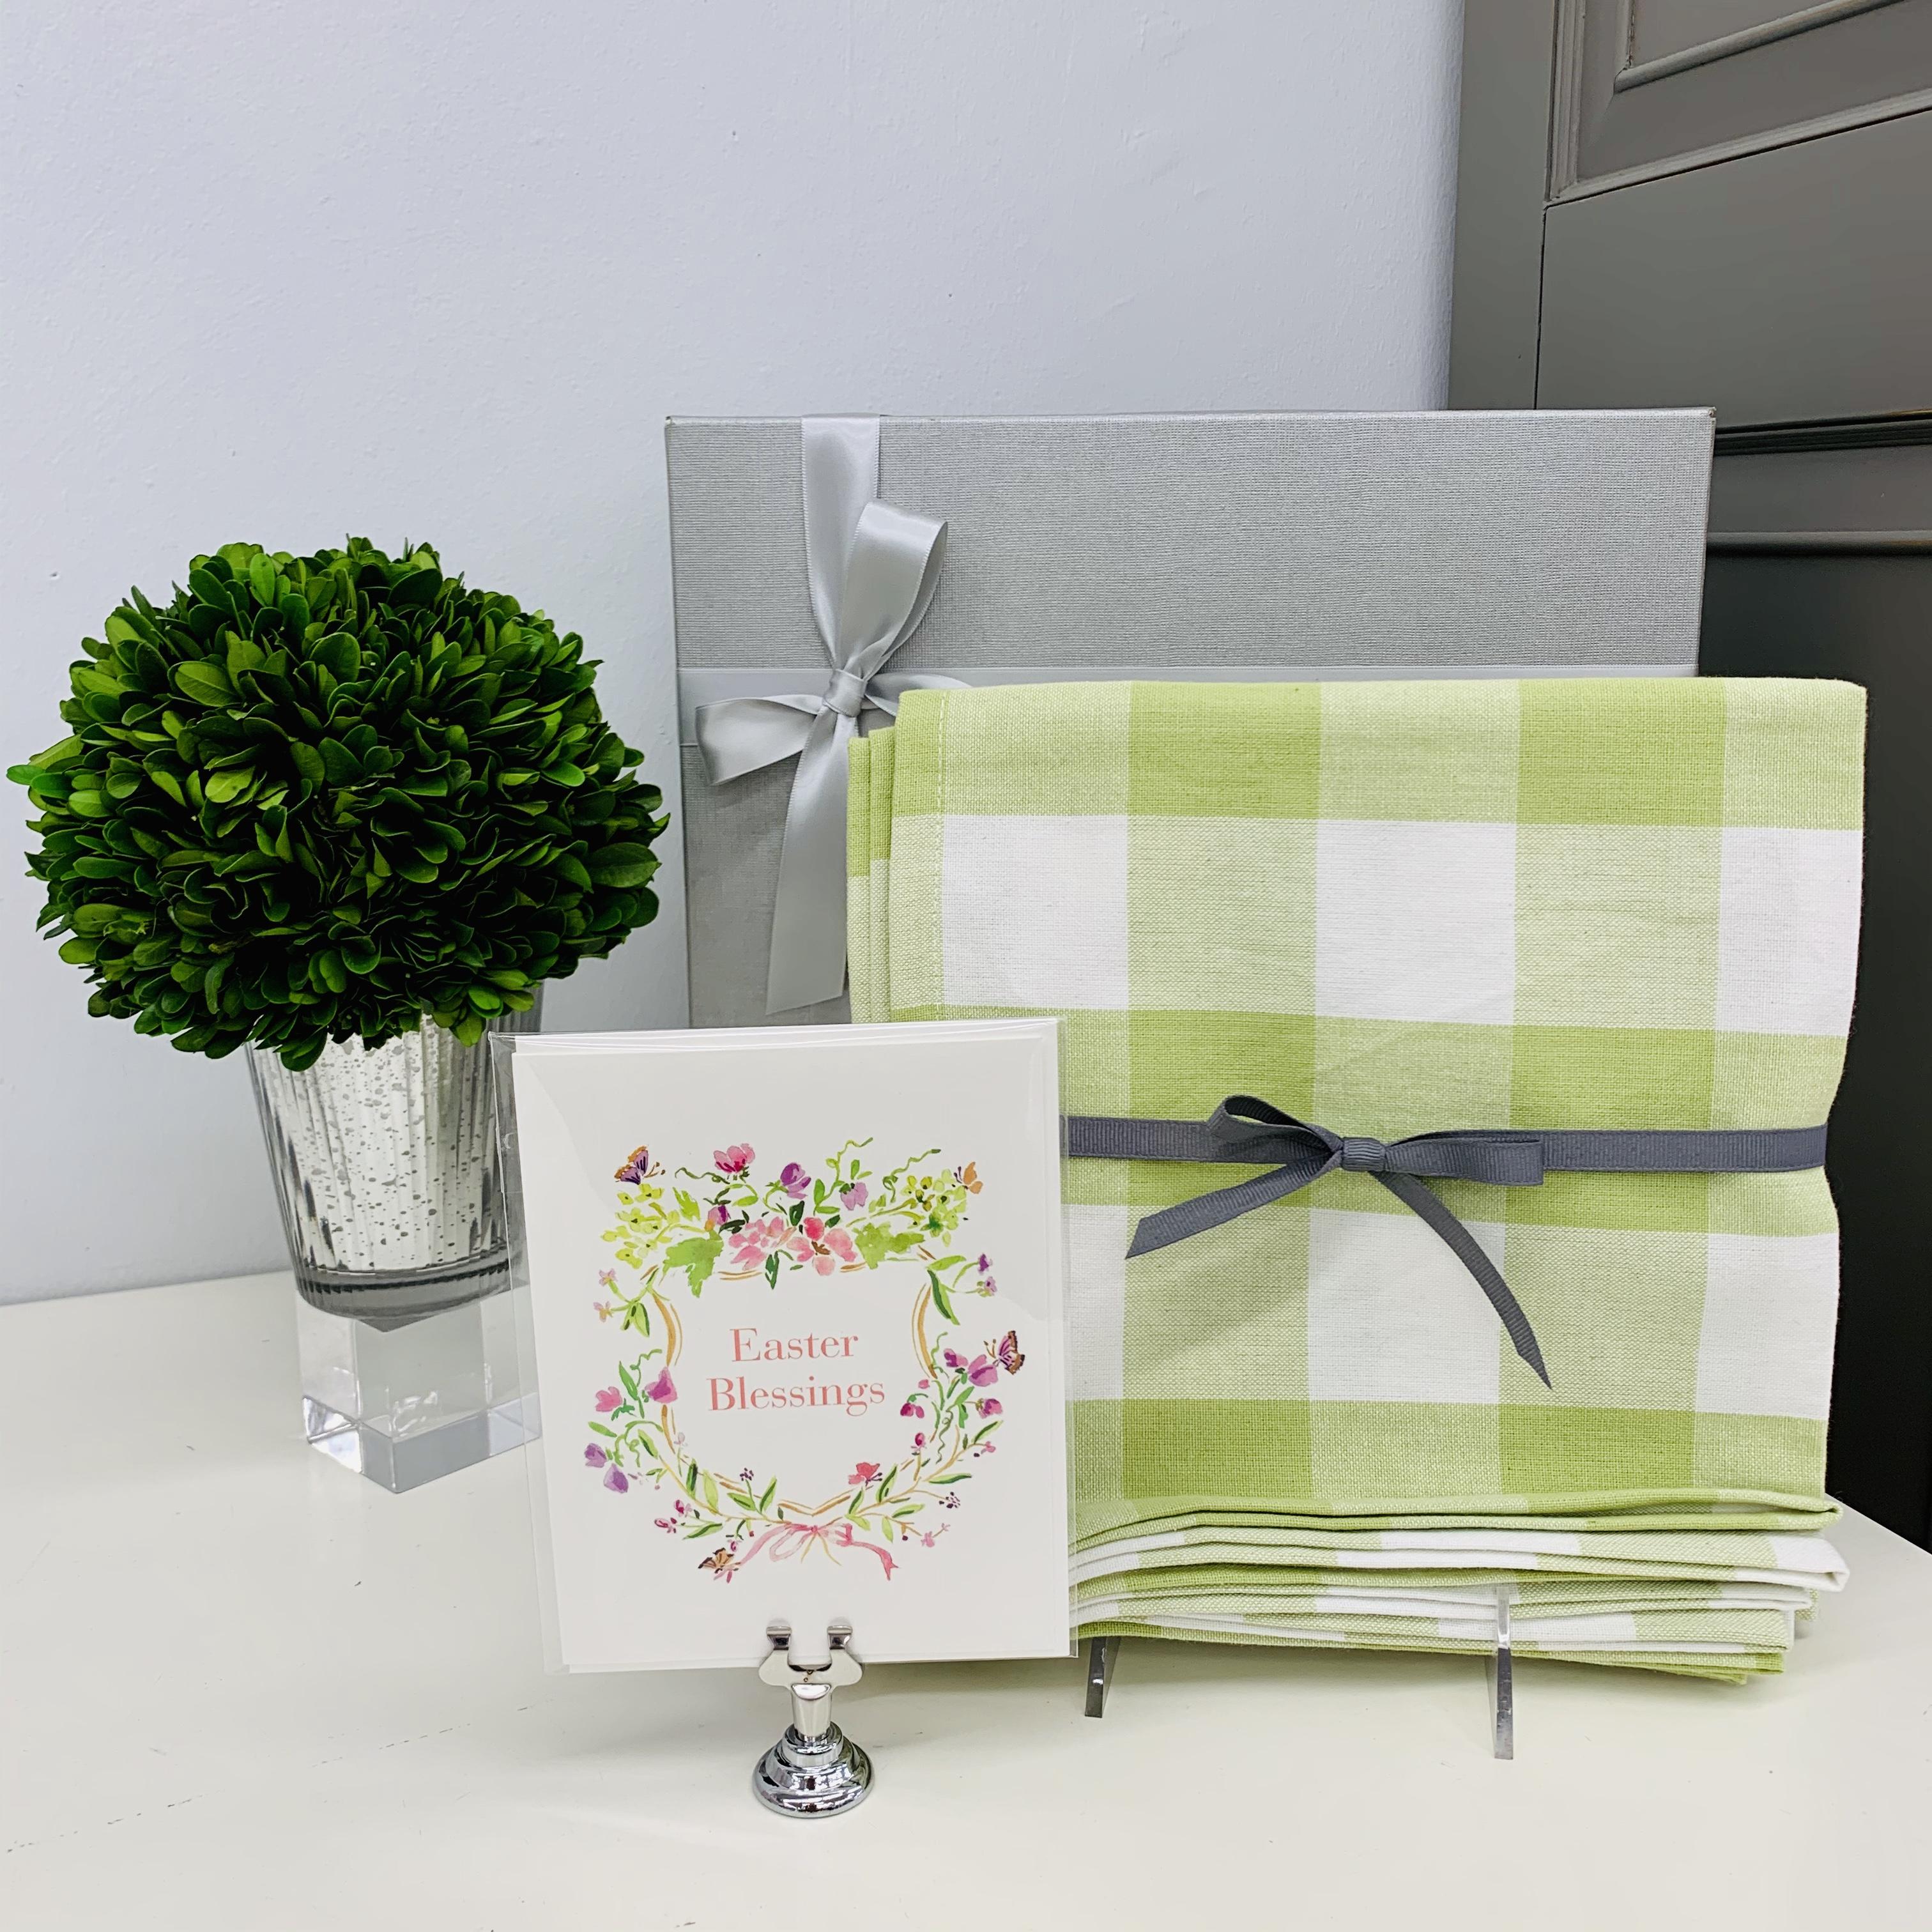 Easter Gift Set | Napkins